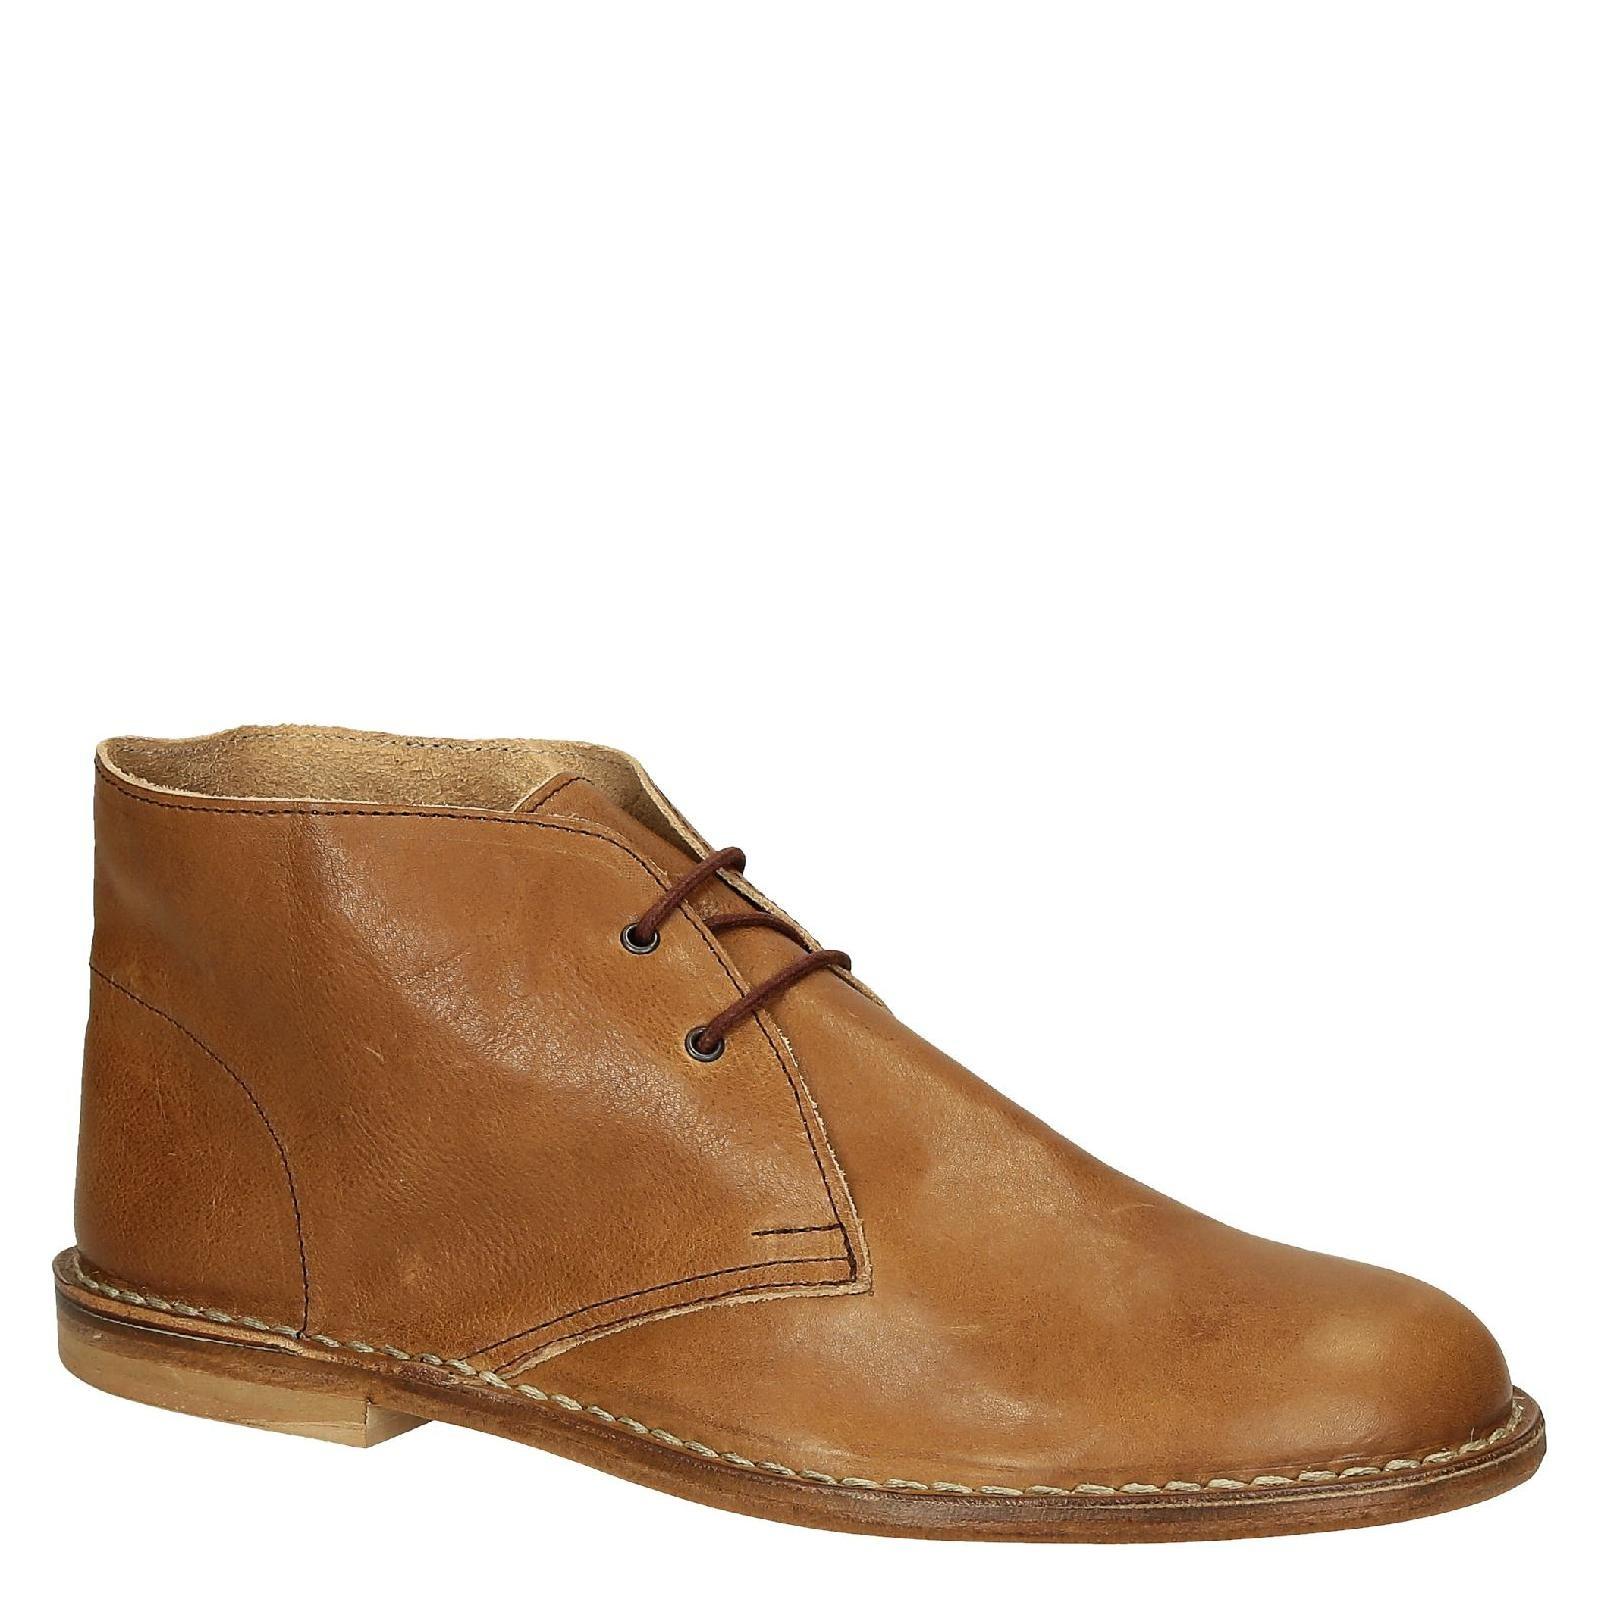 calf italian leather s chukka boots handmade